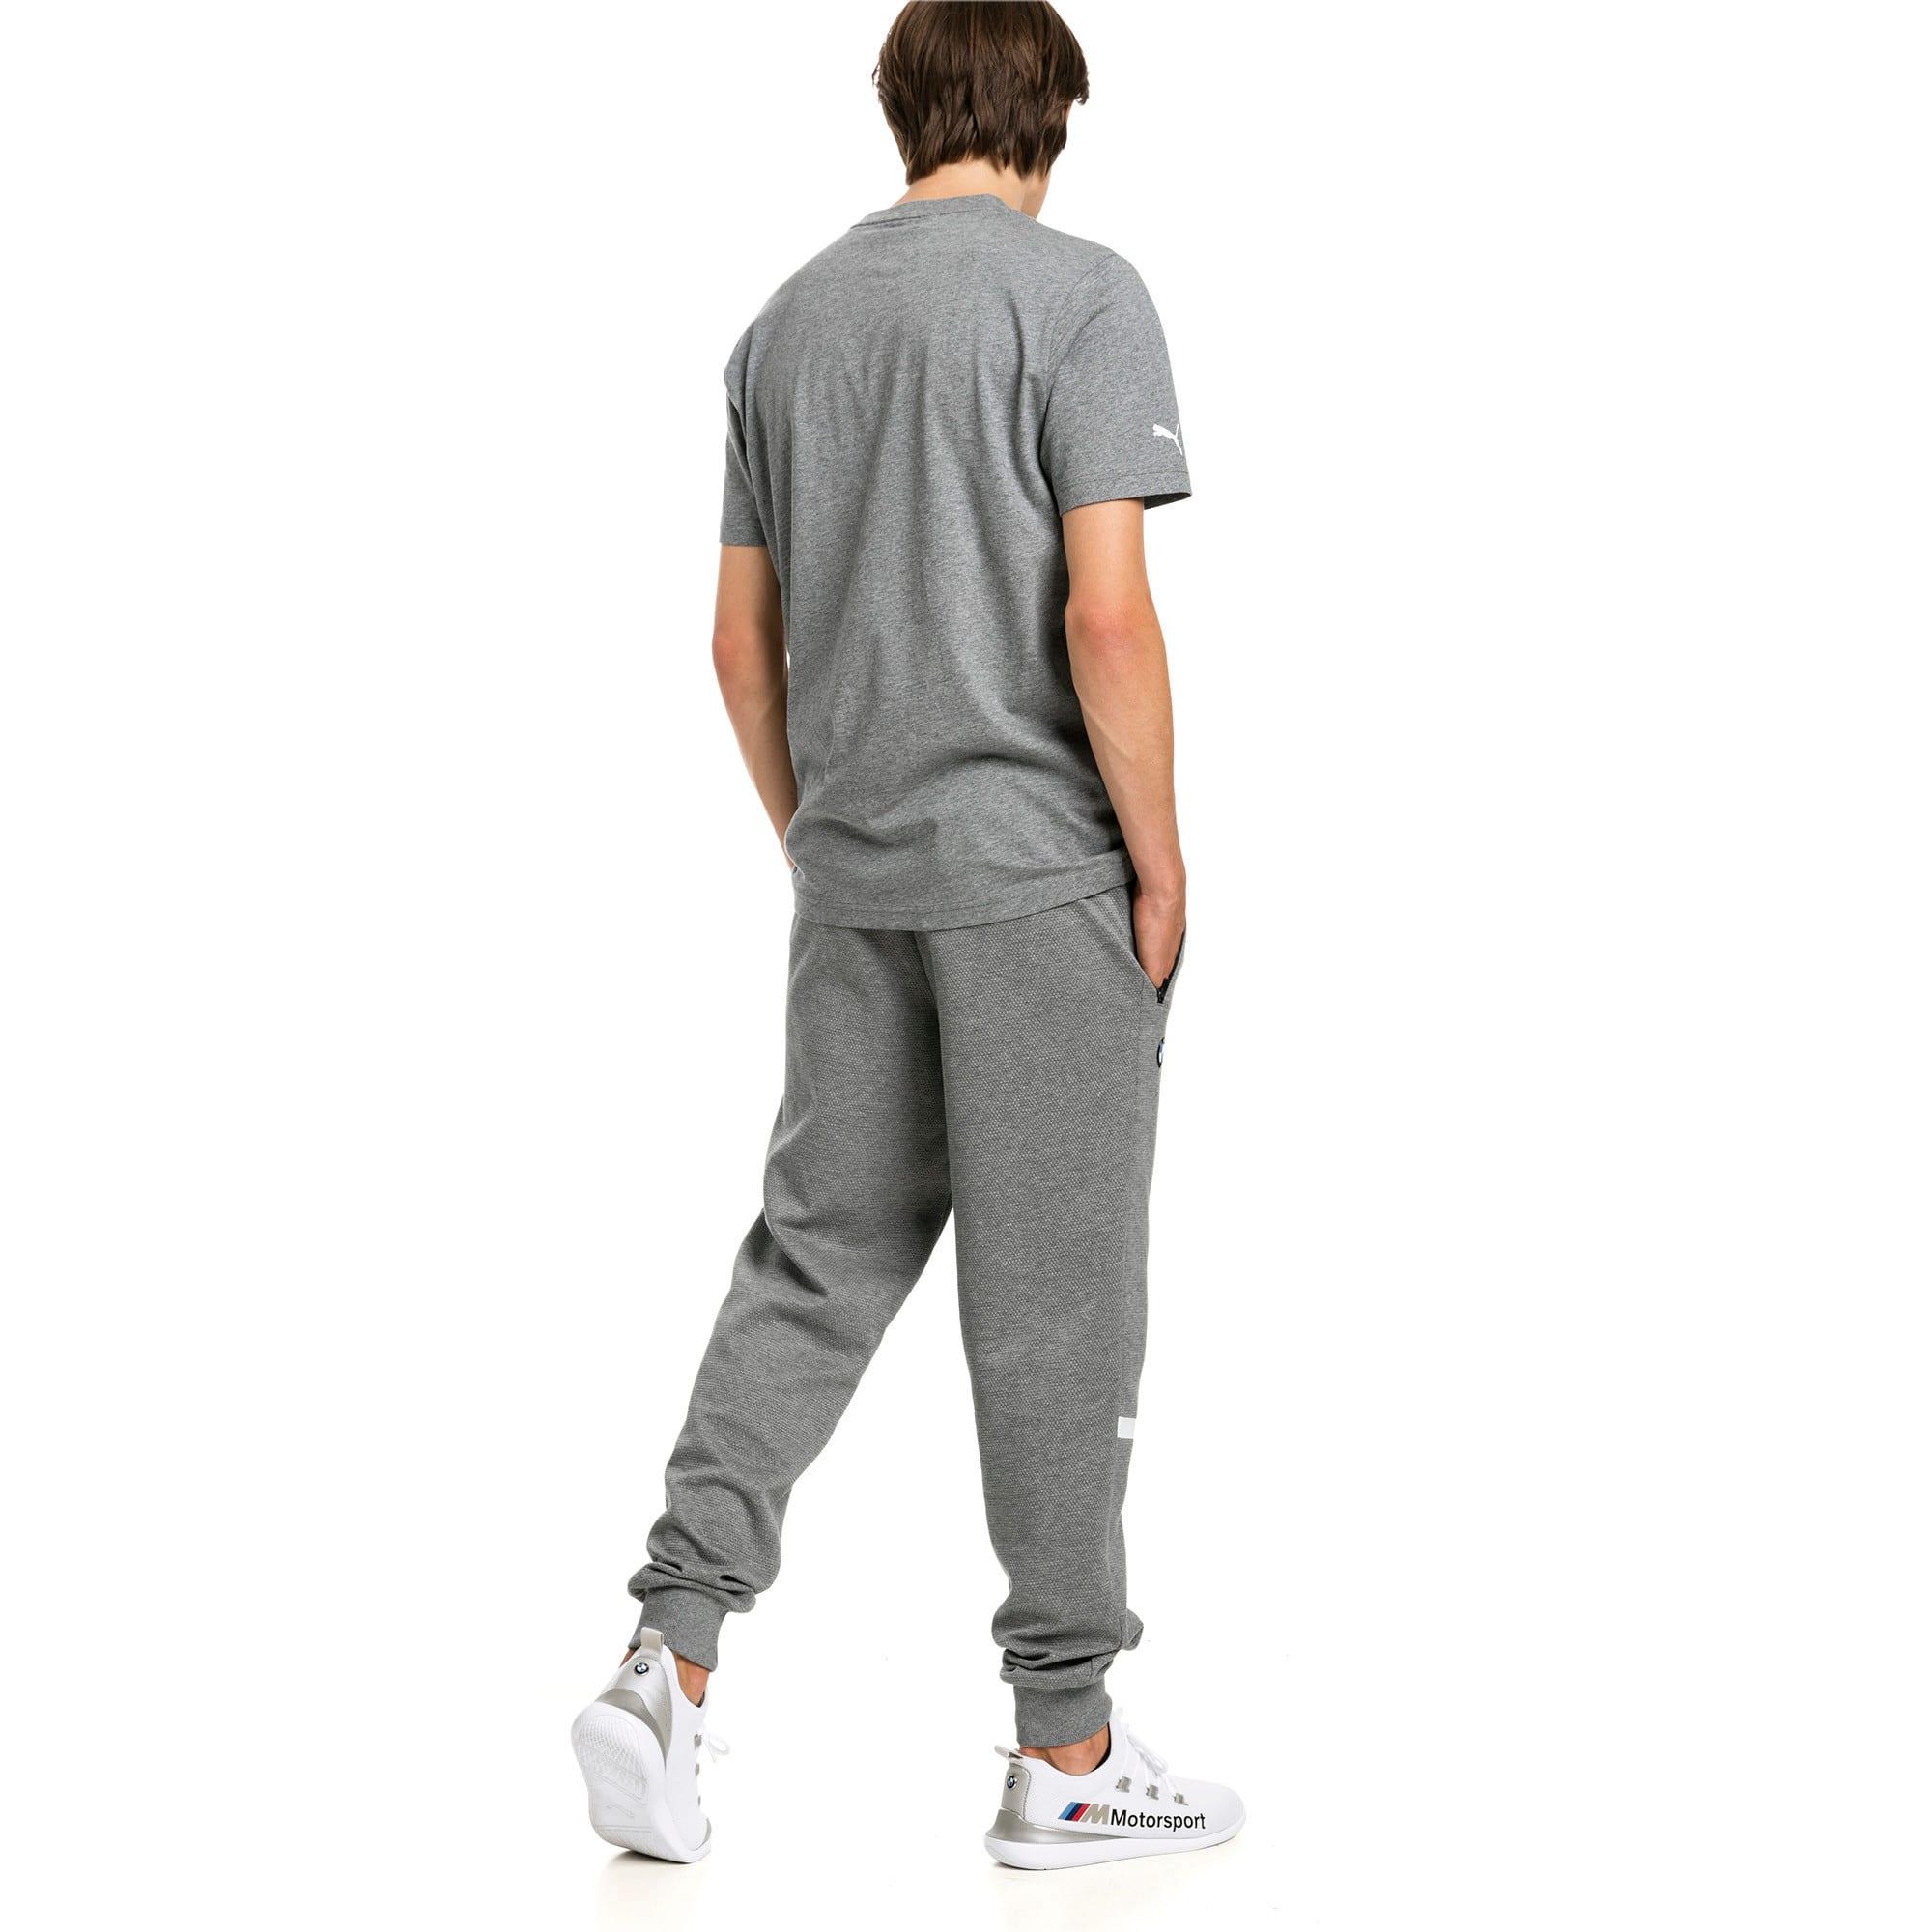 Miniatura 2 de Pantalones deportivos BMW M Motorsport para hombre, Medium Gray Heather, mediano